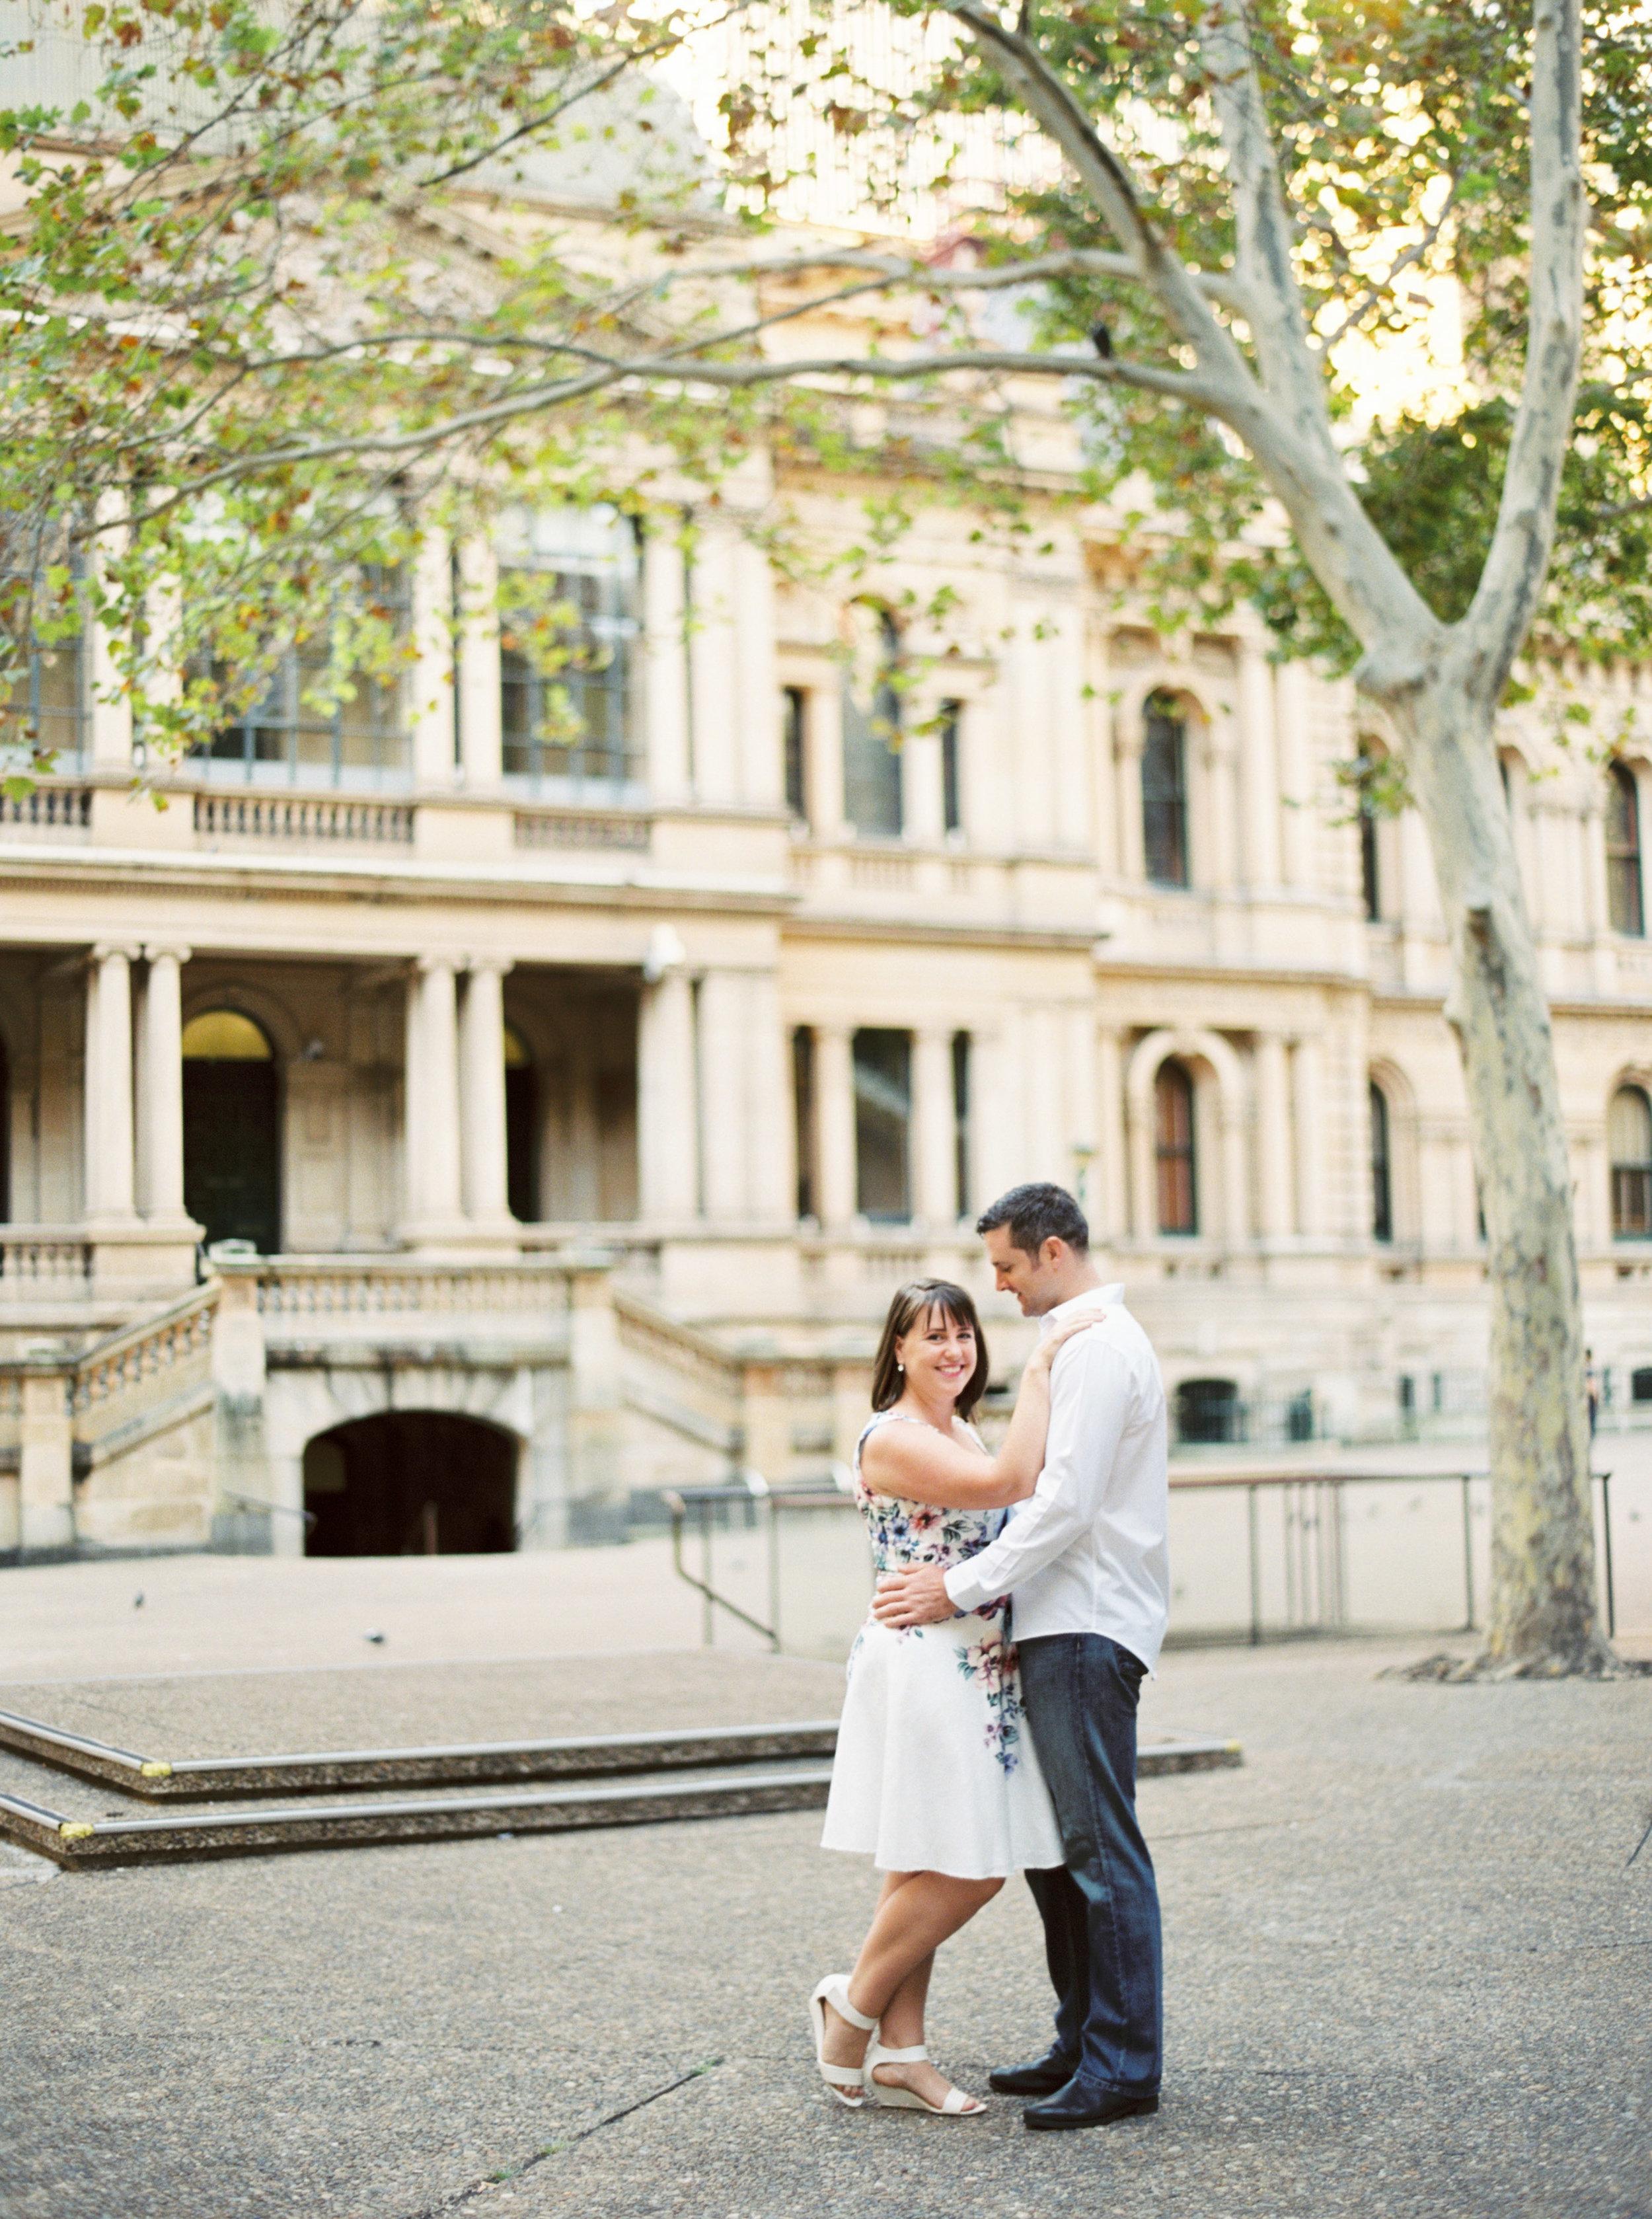 00003- Fine Art Film Newcastle Sydney NSW Wedding Photographer Sheri McMahon.jpg